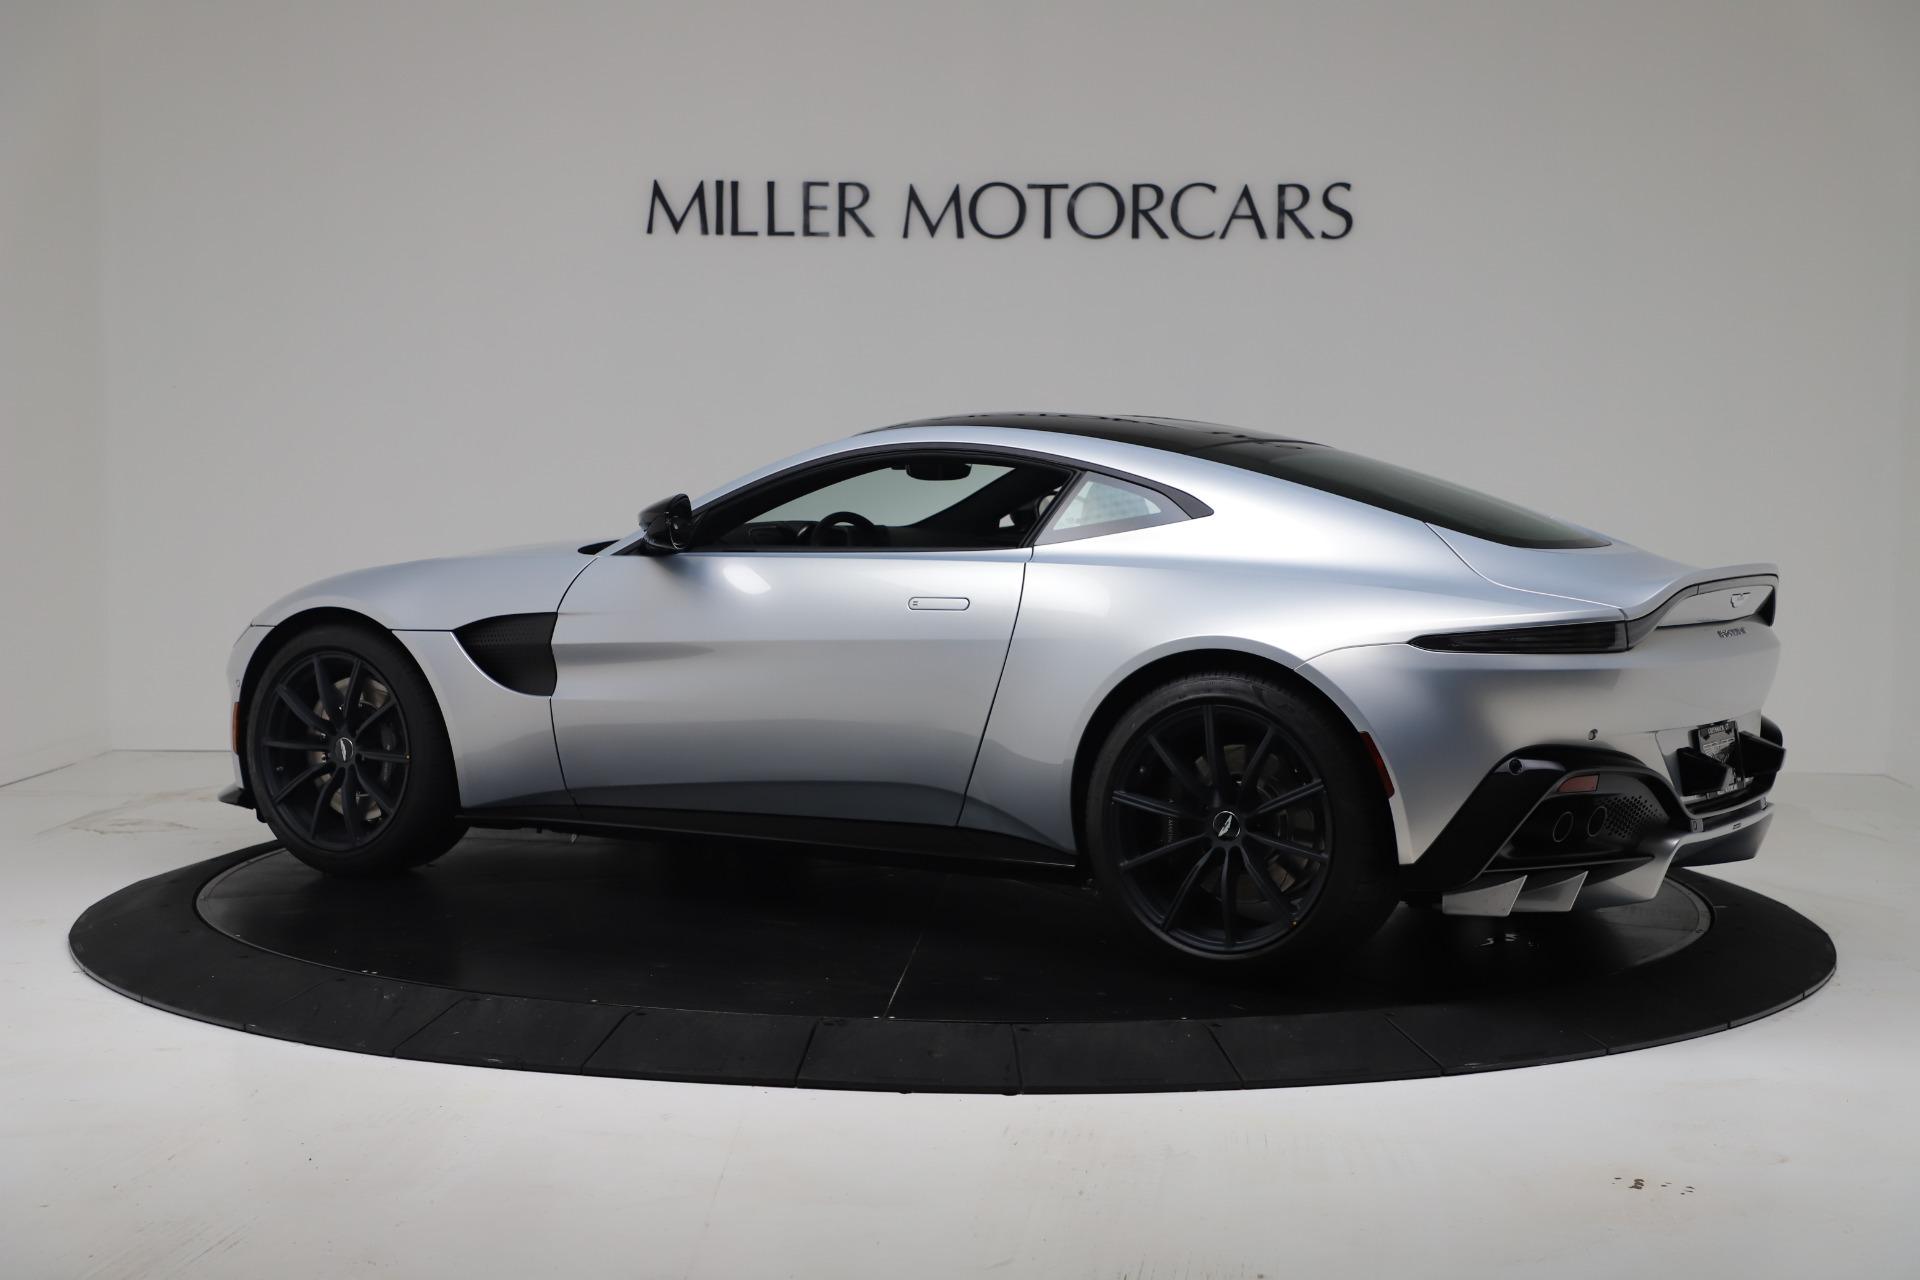 New 2020 Aston Martin Vantage V8 For Sale In Westport, CT 3481_p22